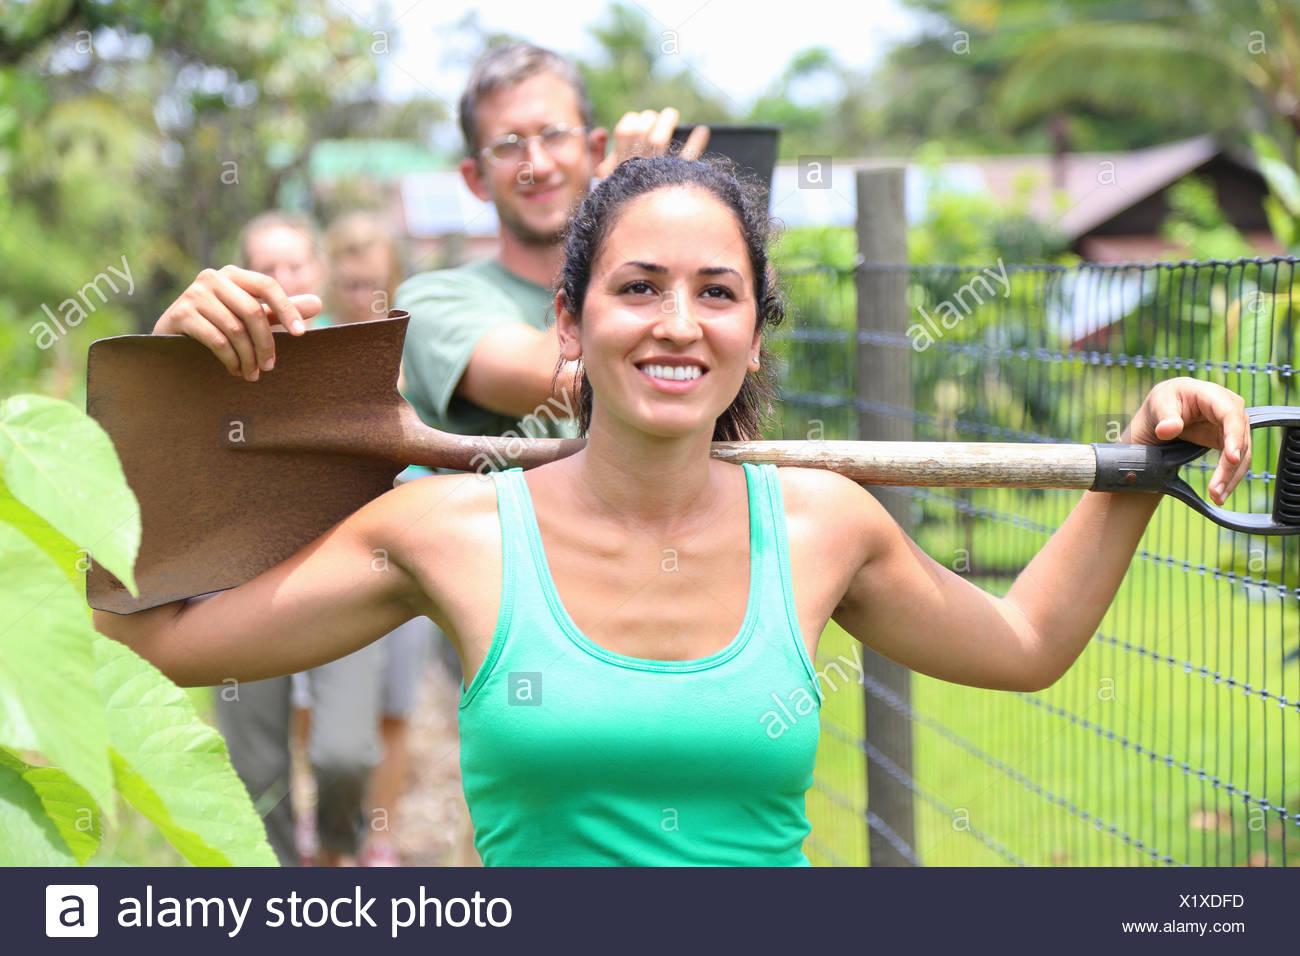 Smiling woman wearing green tank top carrying shovel on shoulders through community garden - Stock Image